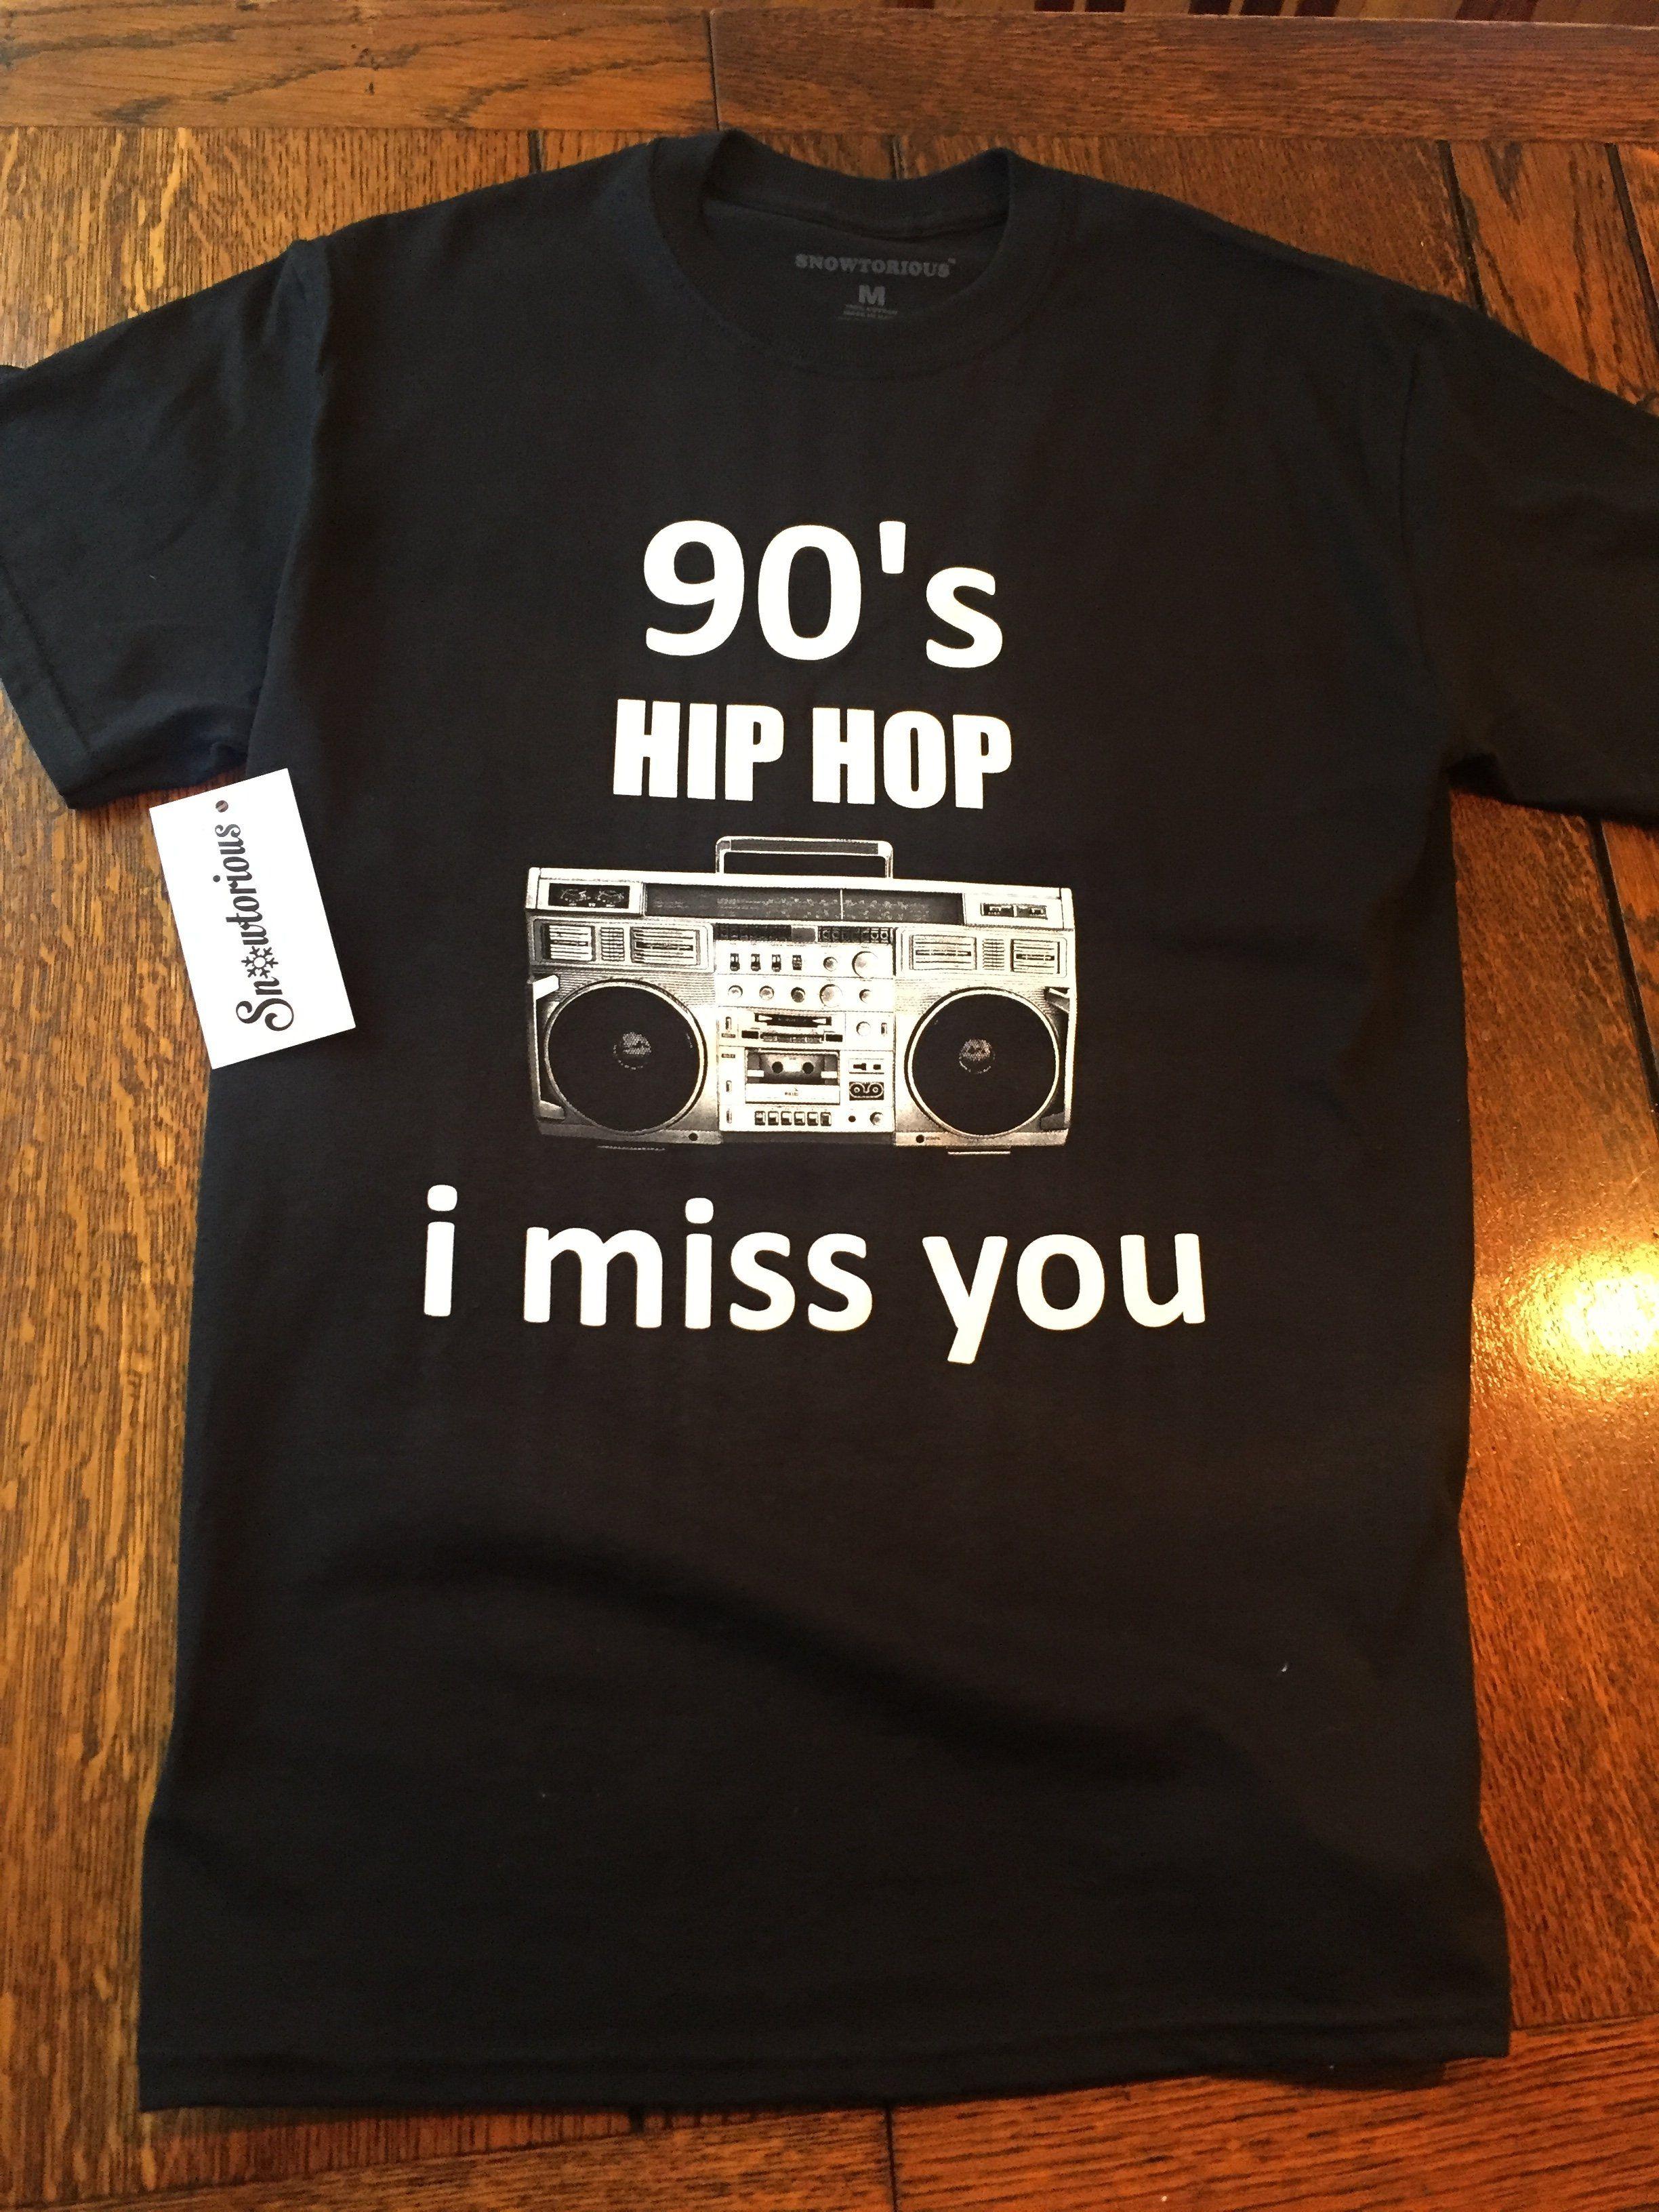 Biggie Tupac Aaliyah RIP White Tee Hip Hop R/&B Tee T-shirt Top by Actual Fact